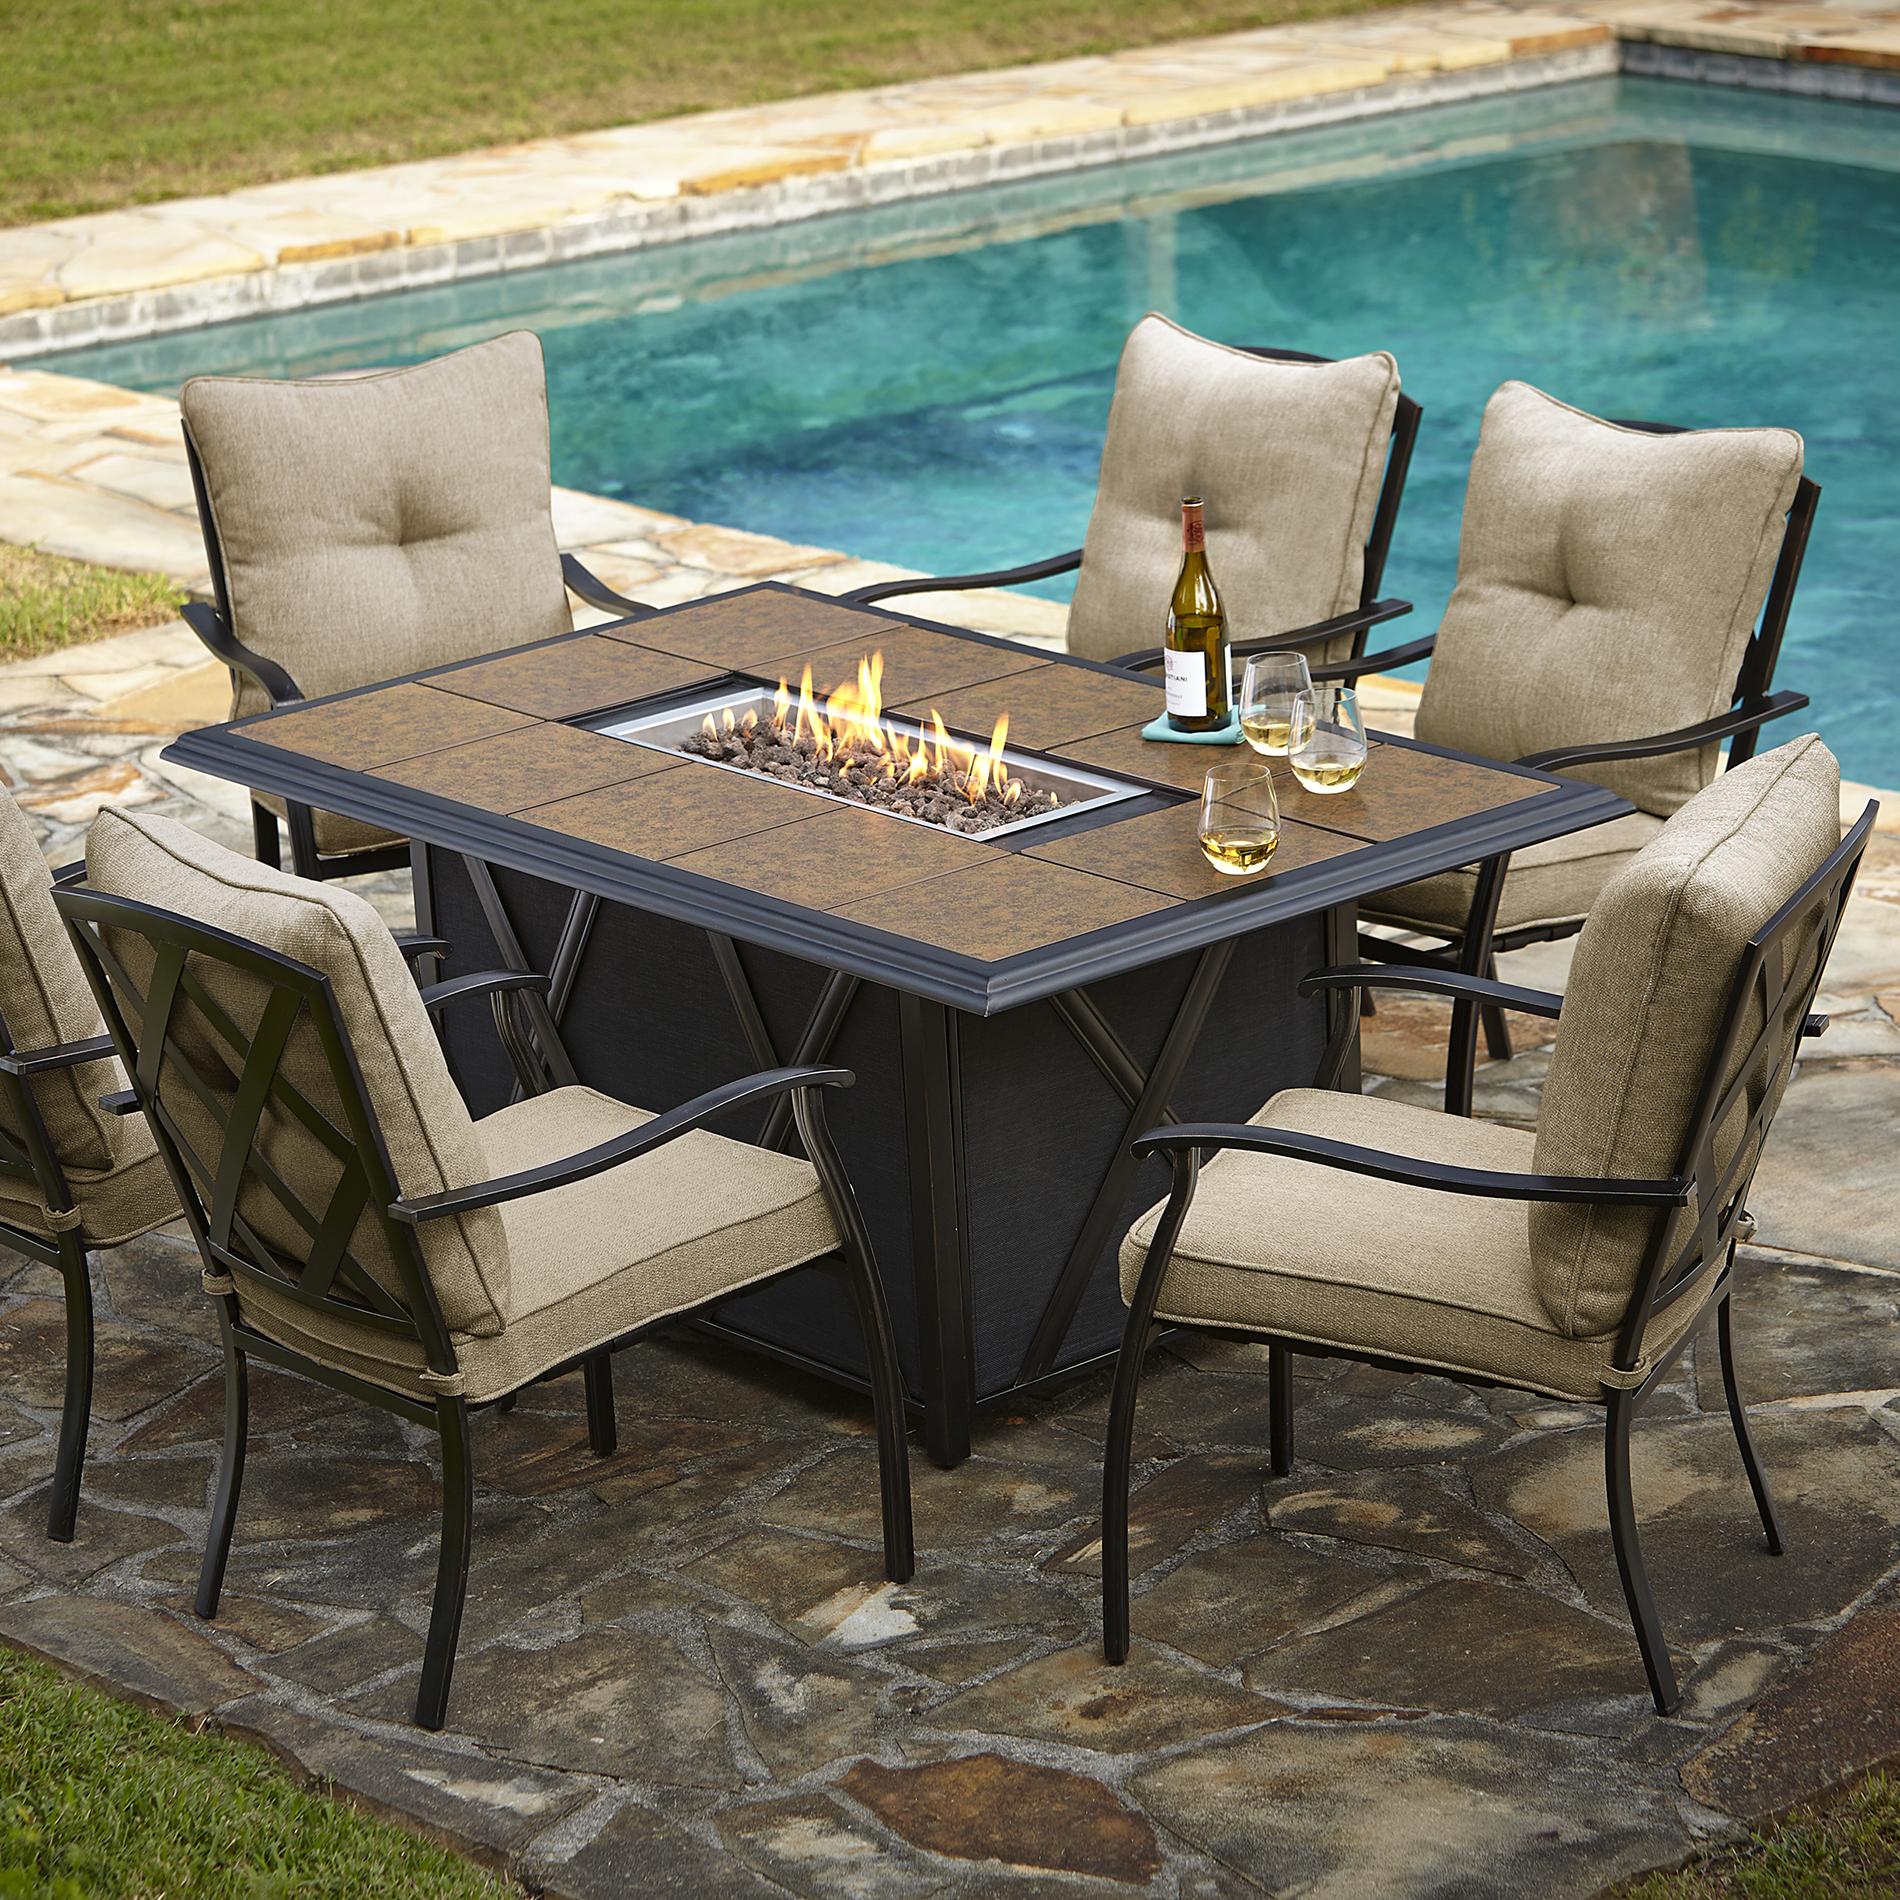 Grand Resort Wildwood 7pc Lp Fire Dining Set - Limited